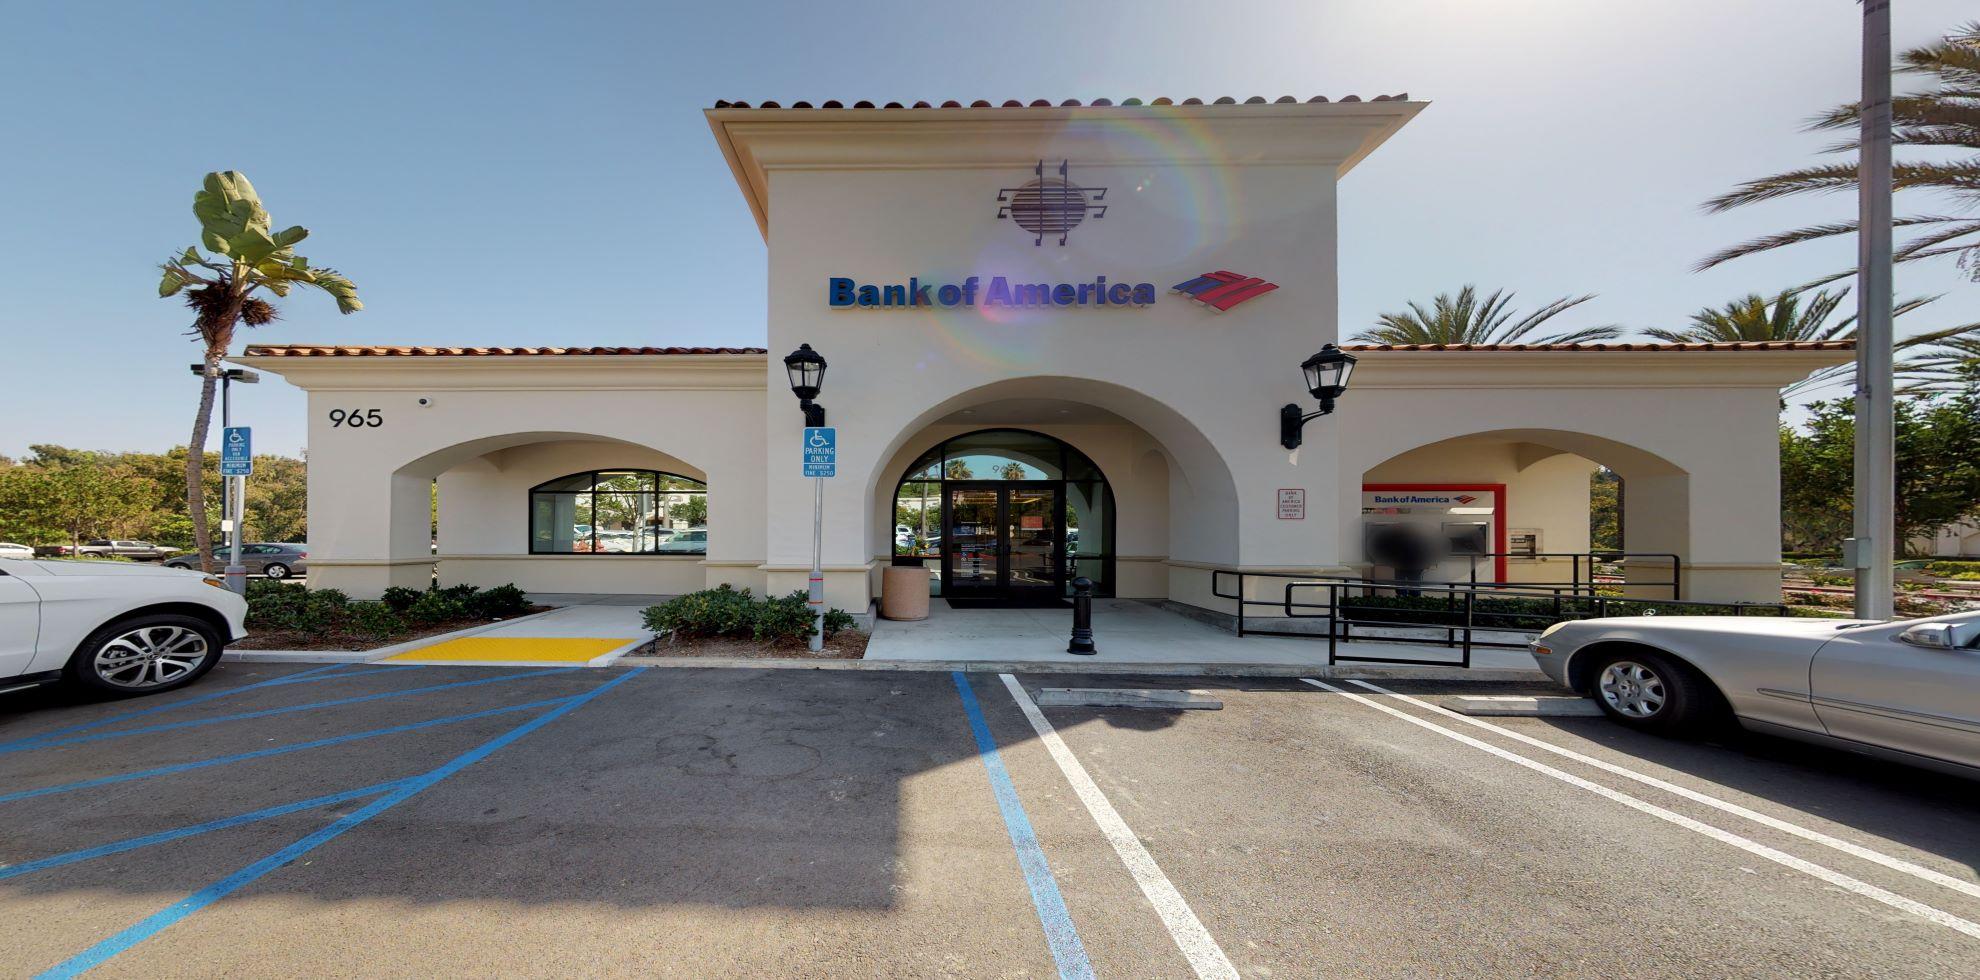 Bank of America financial center with drive-thru ATM | 965 Avenida Pico, San Clemente, CA 92673